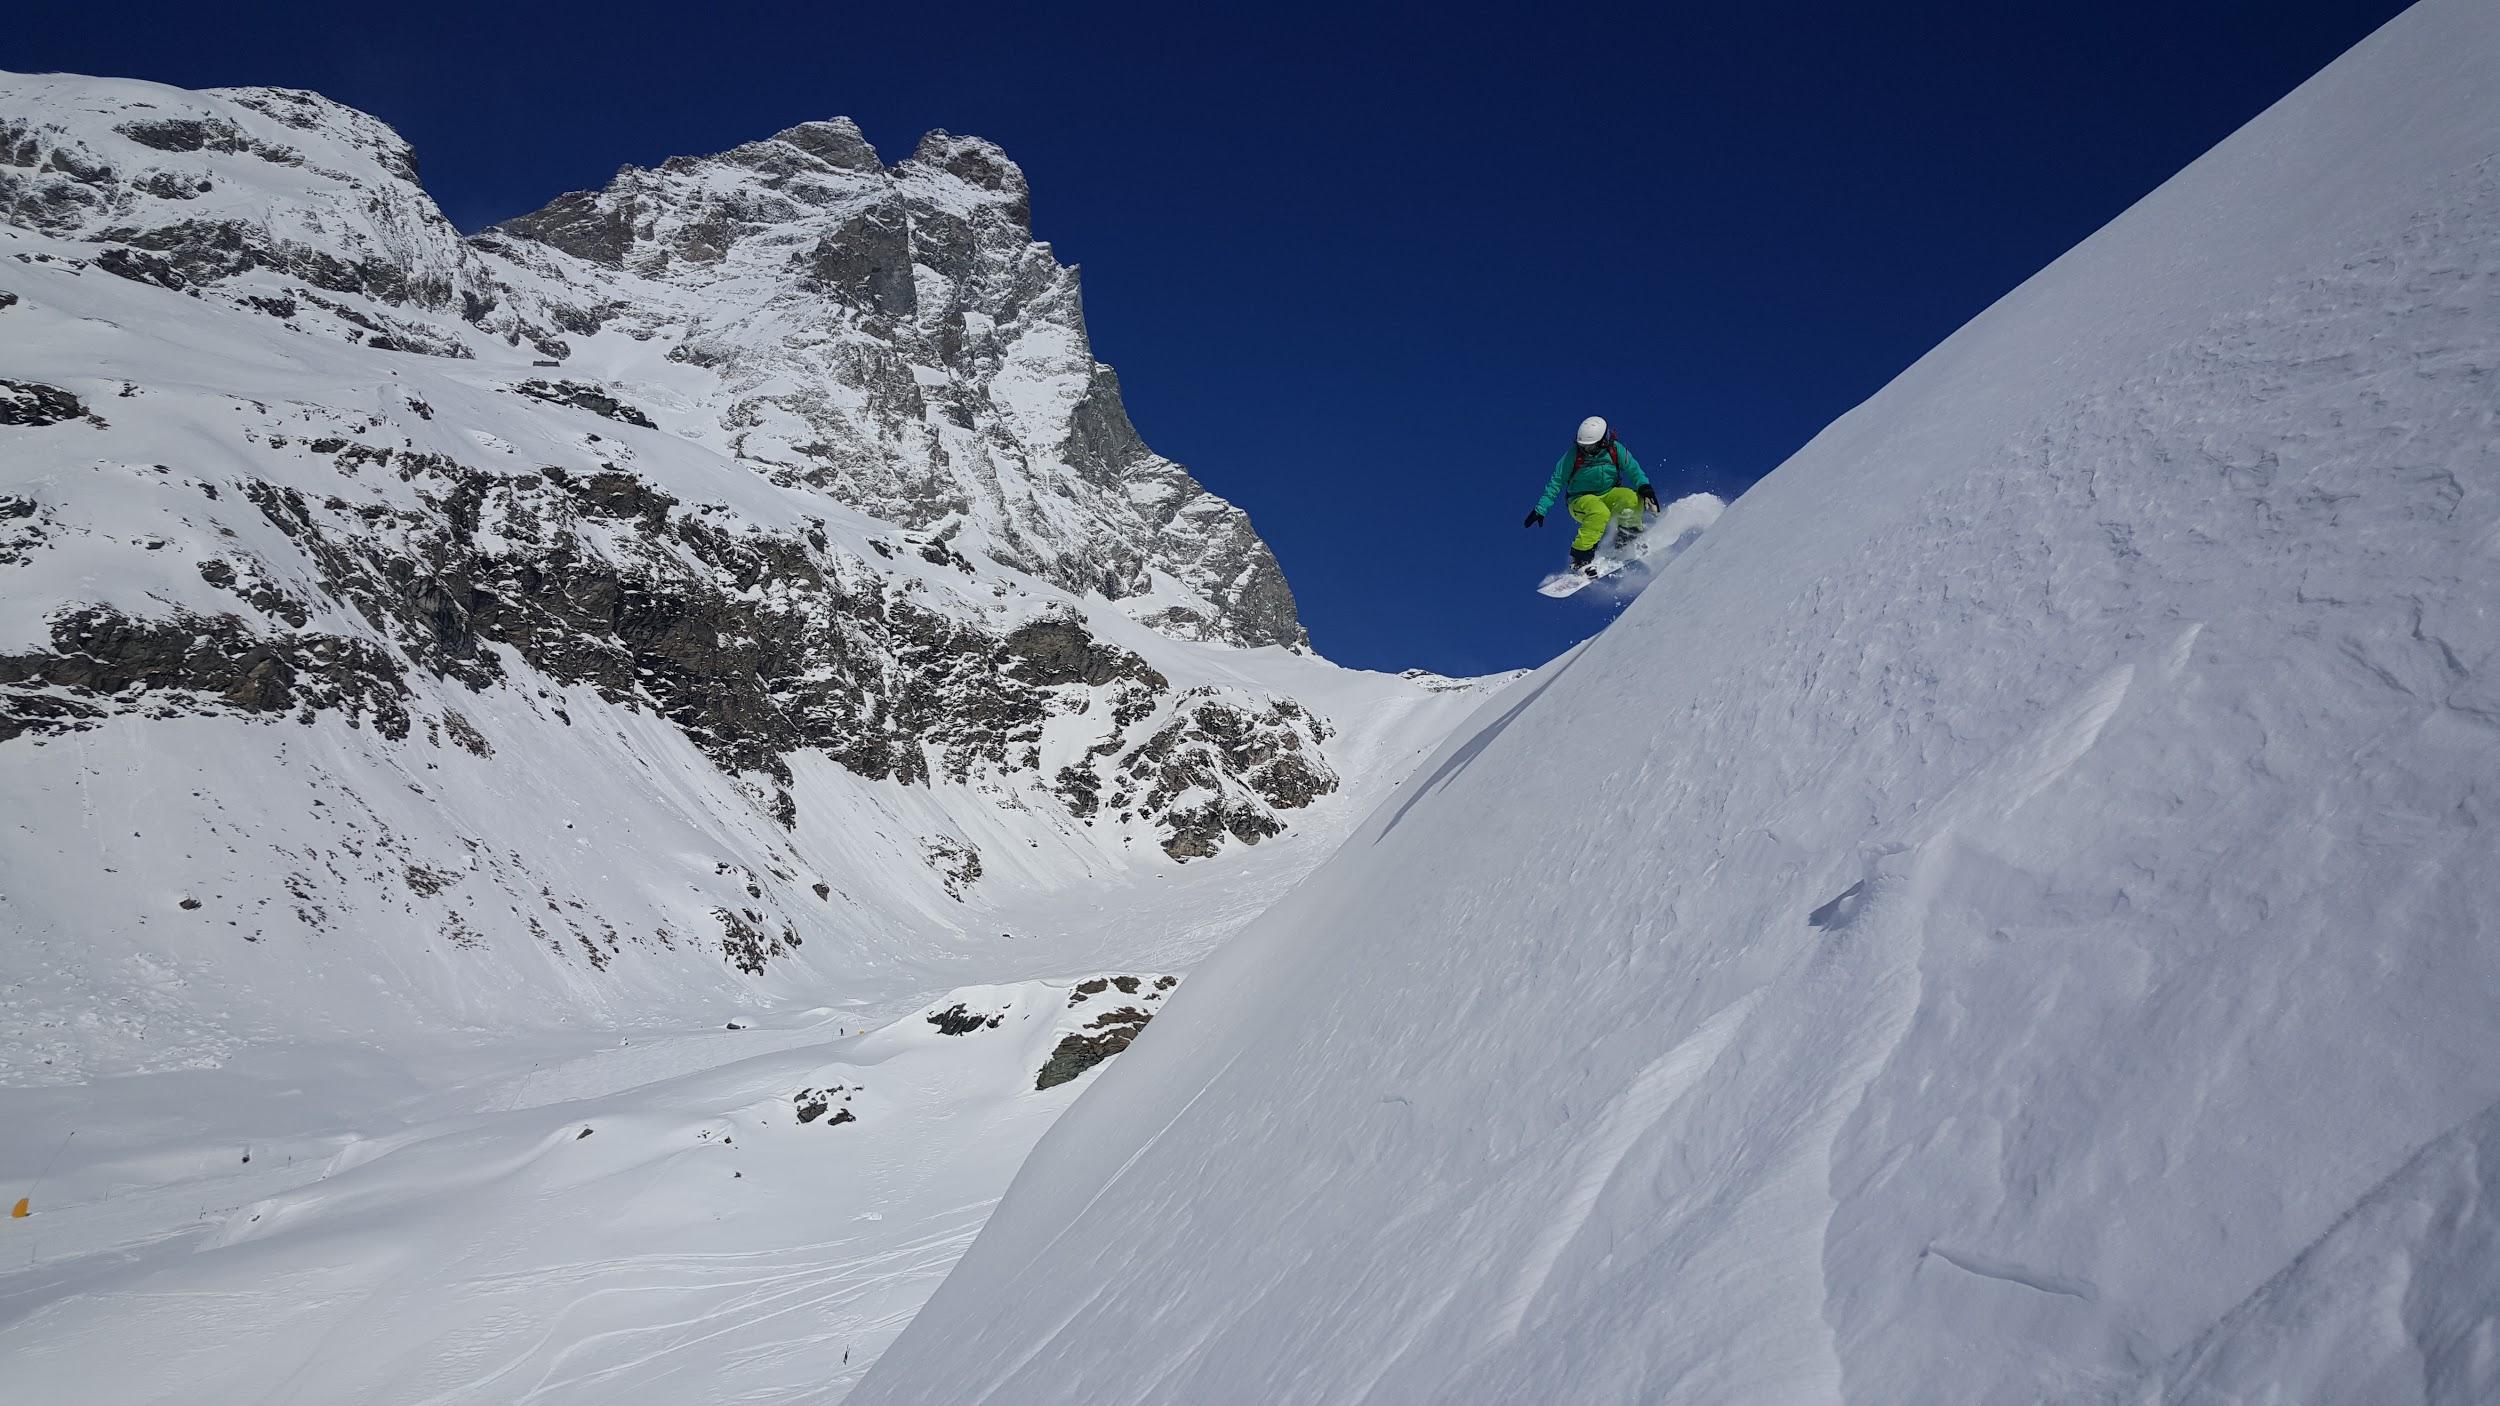 67b3a4ebece Top Beginner Snowboard Tricks to Try on your Chamonix Winter Break ...